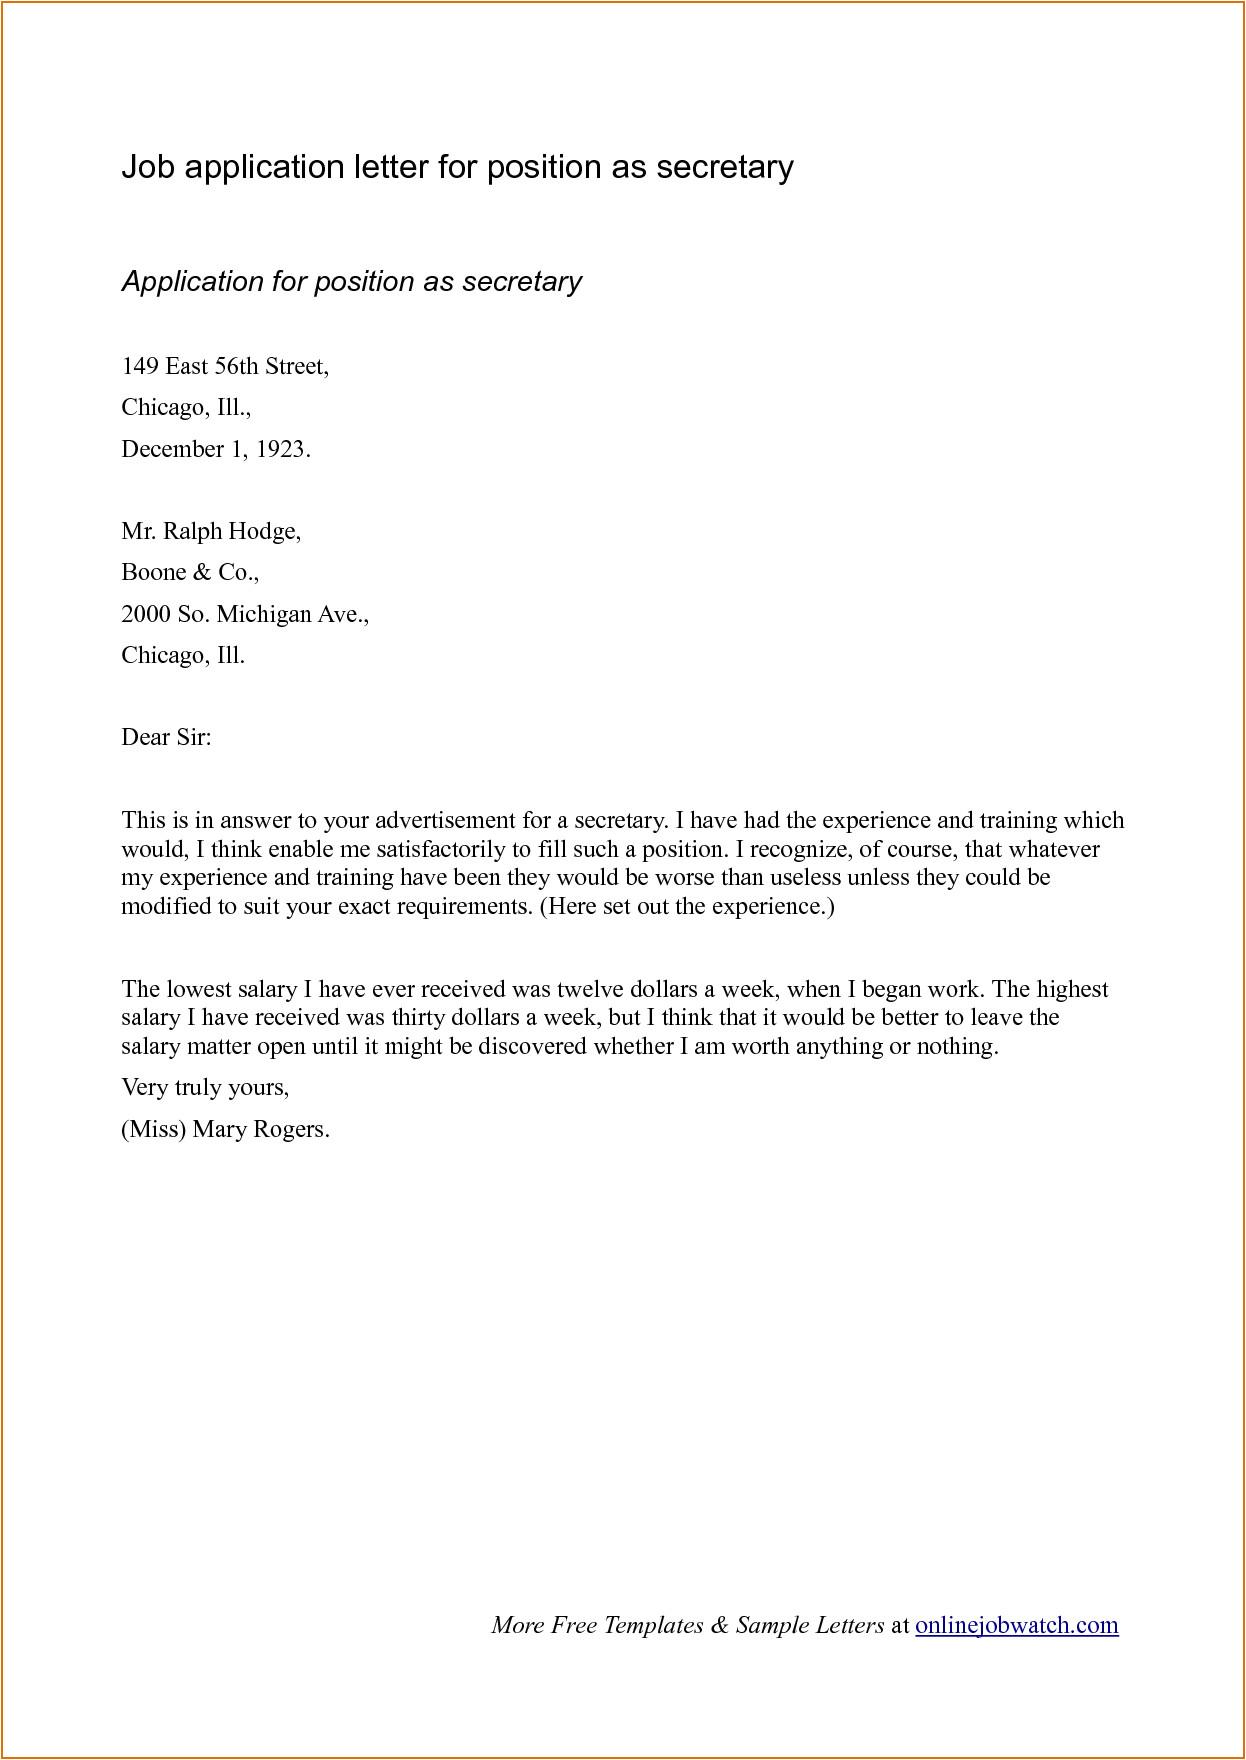 sample cover letter format for job application 3251